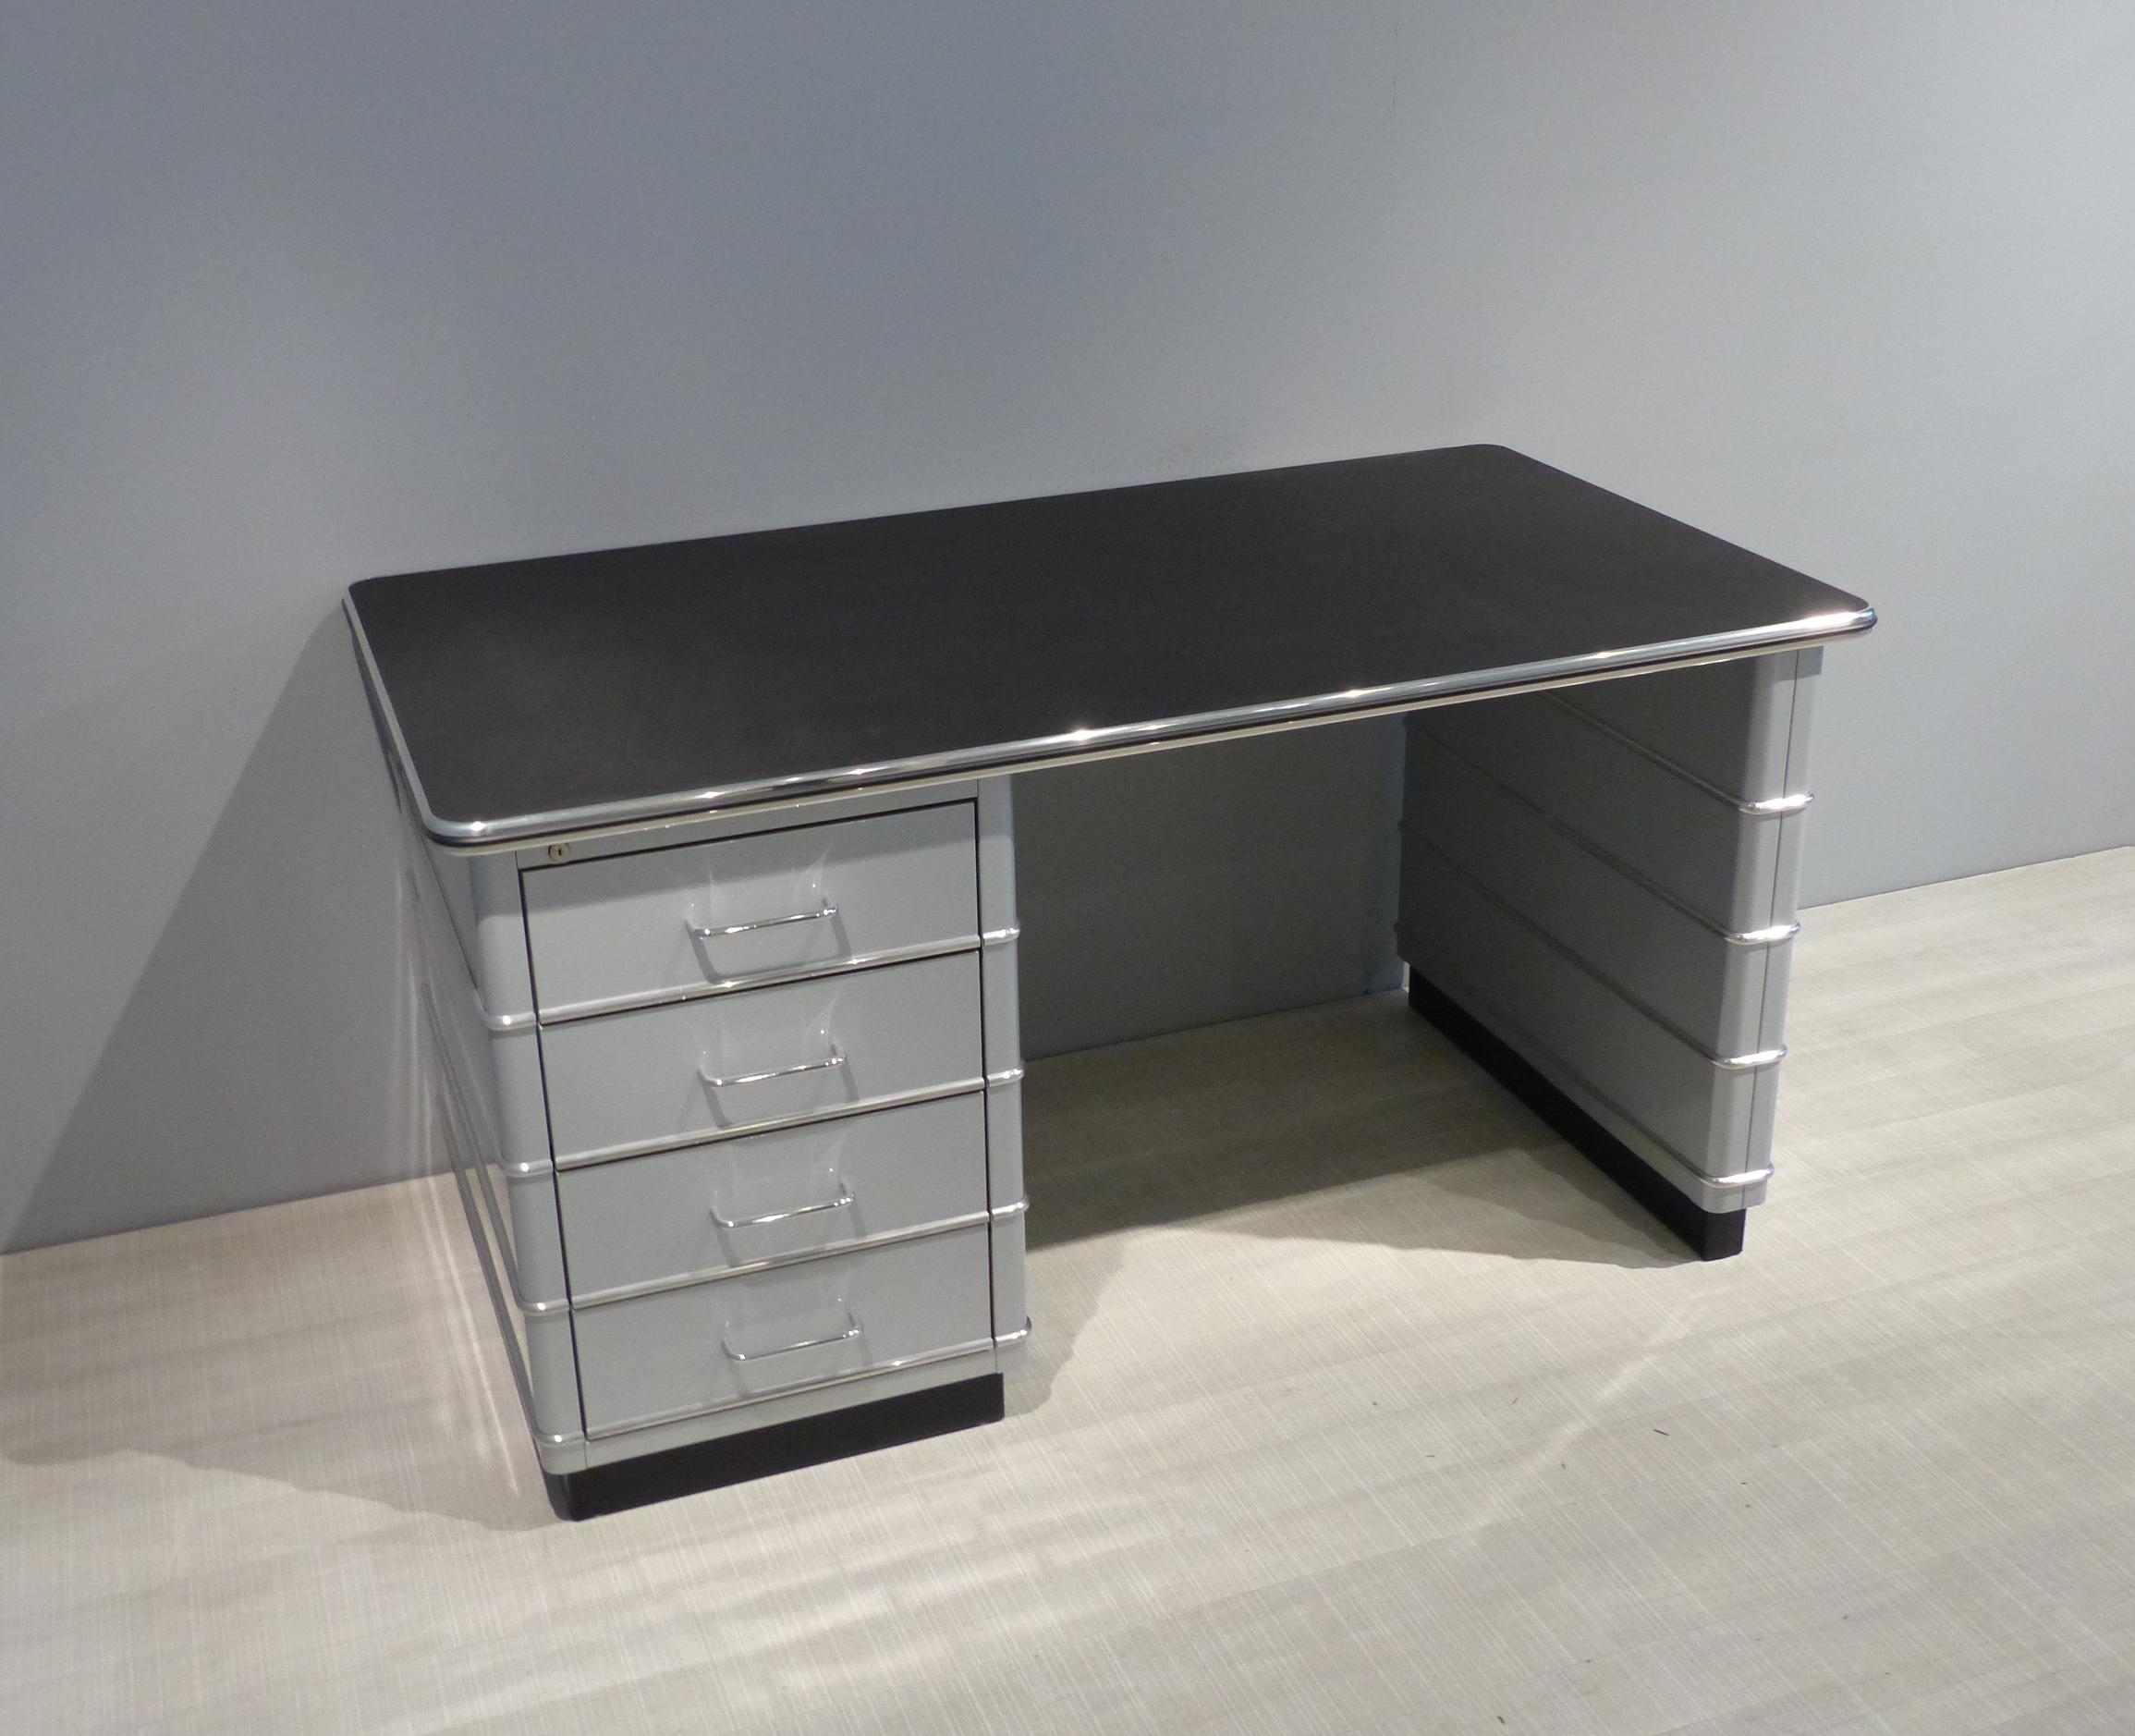 Tb 225 Desk In White Aluminium With Chromed Decorative Trims